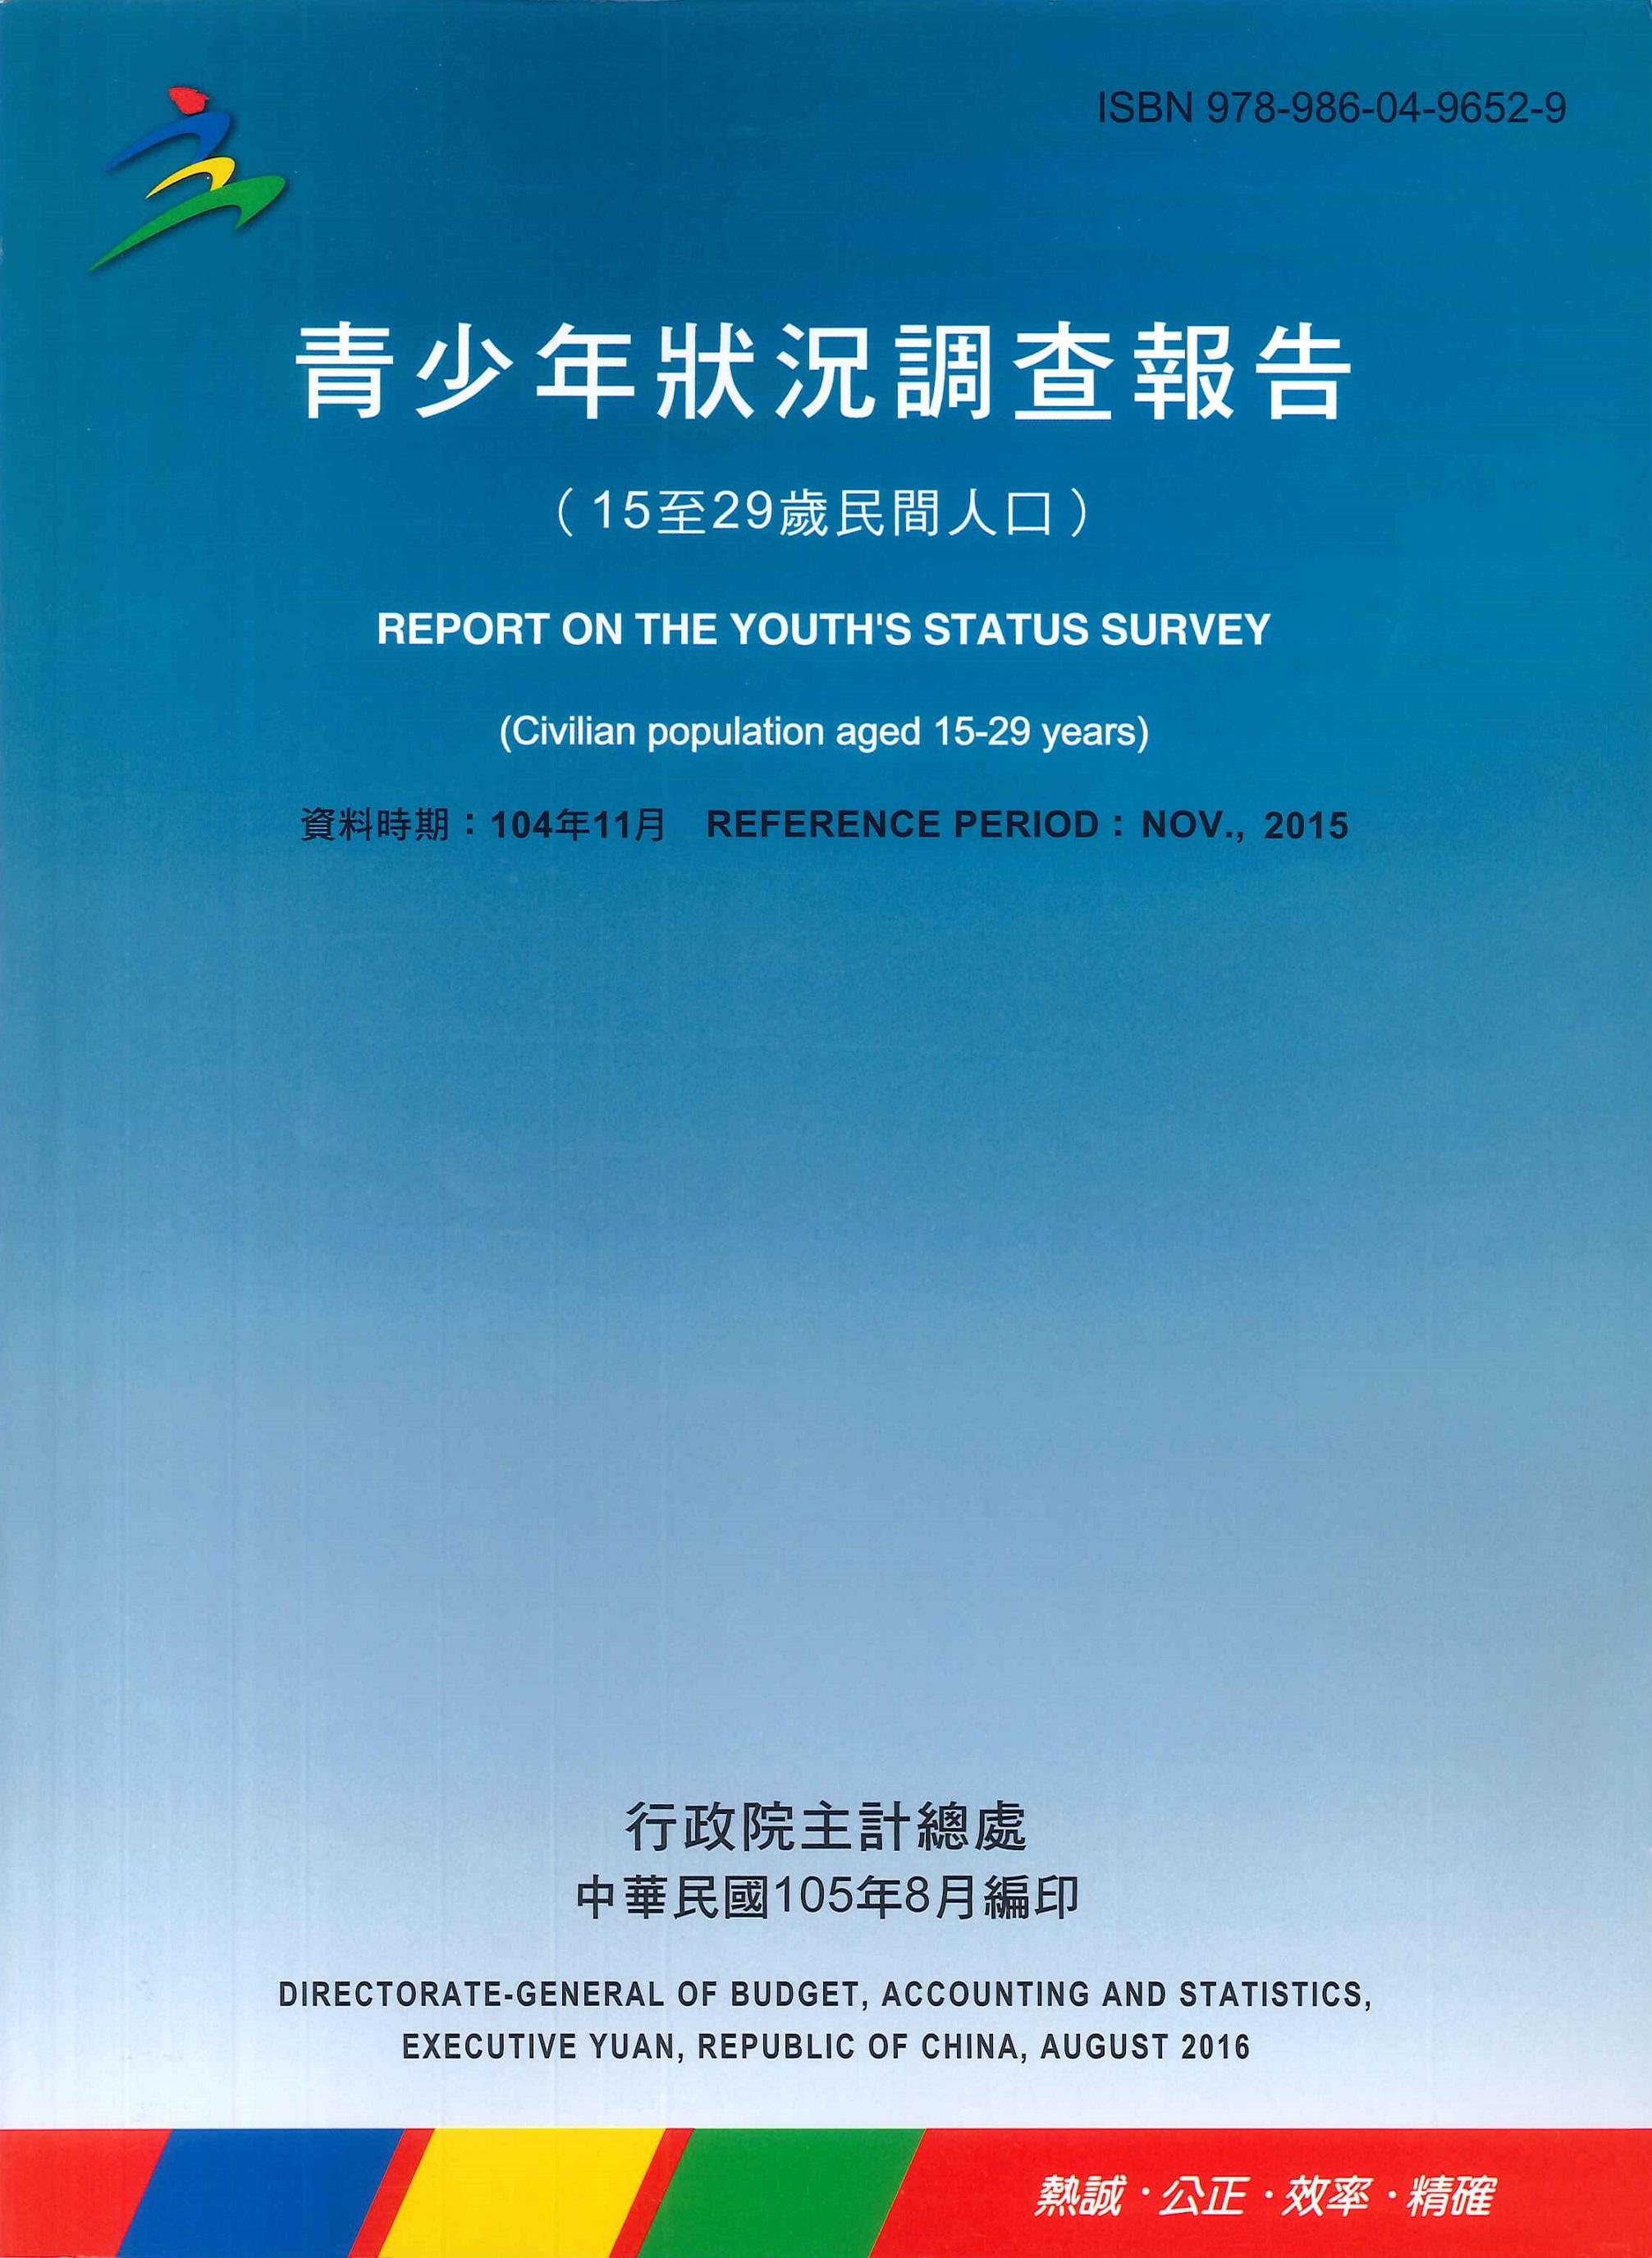 青少年狀況調查報告:(15至29歲民間人口)=Report on the youth